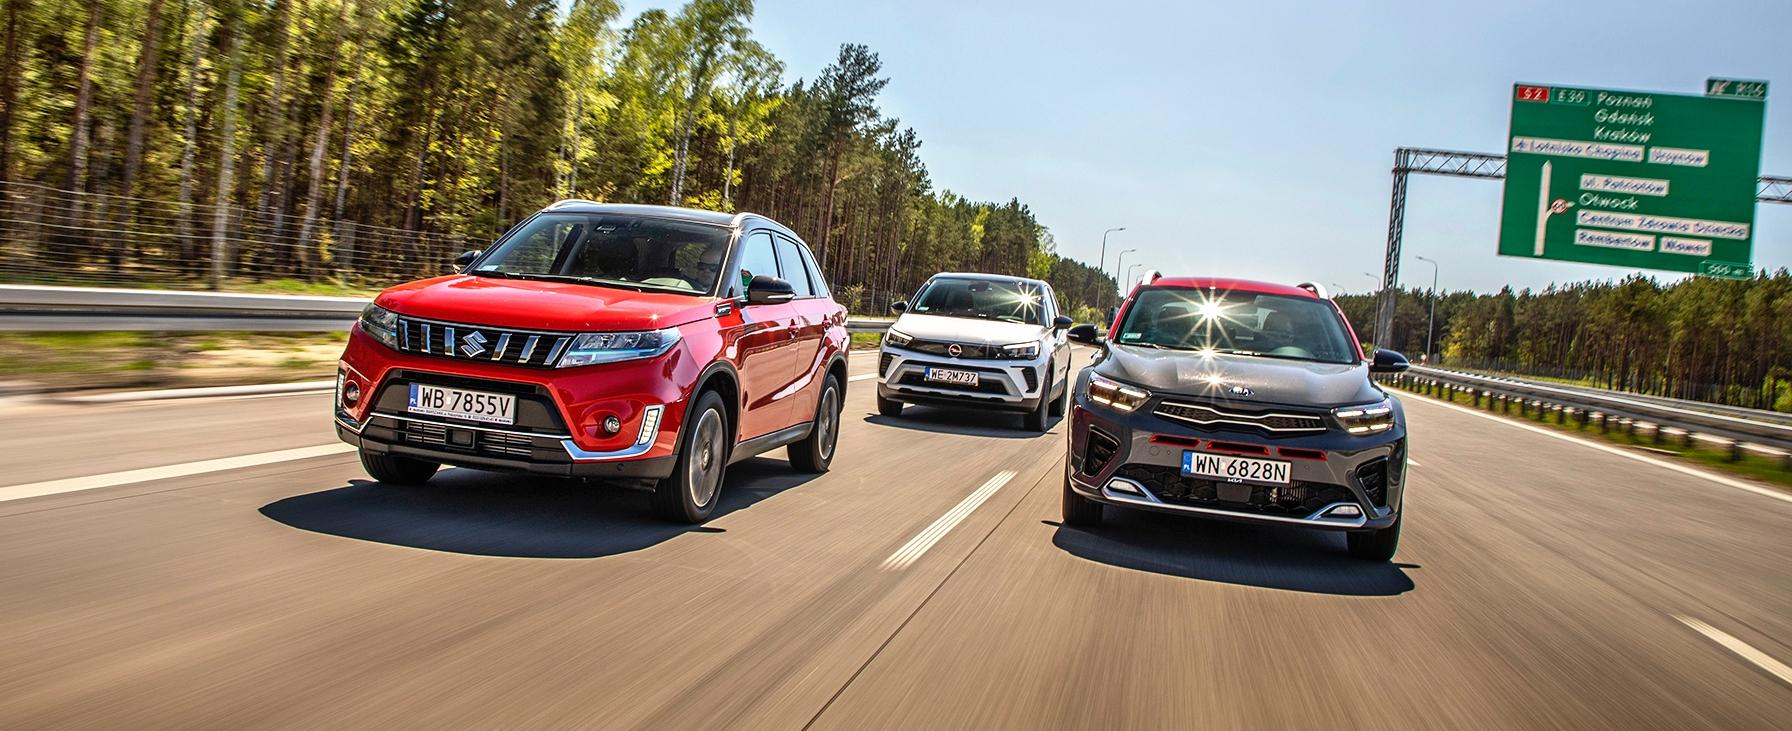 Suzuki Vitara, Opel Crossland, Kia Stonic wtrasie przody